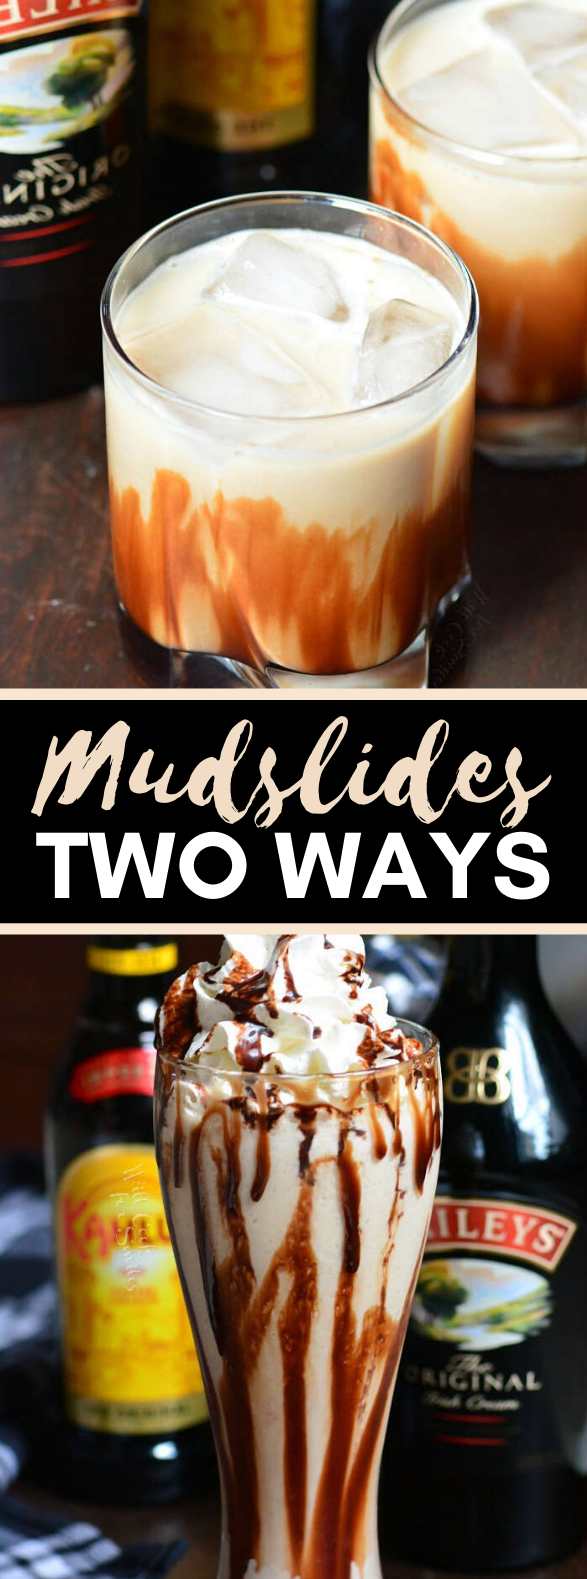 Mudslides Two Ways #drinks #cocktails